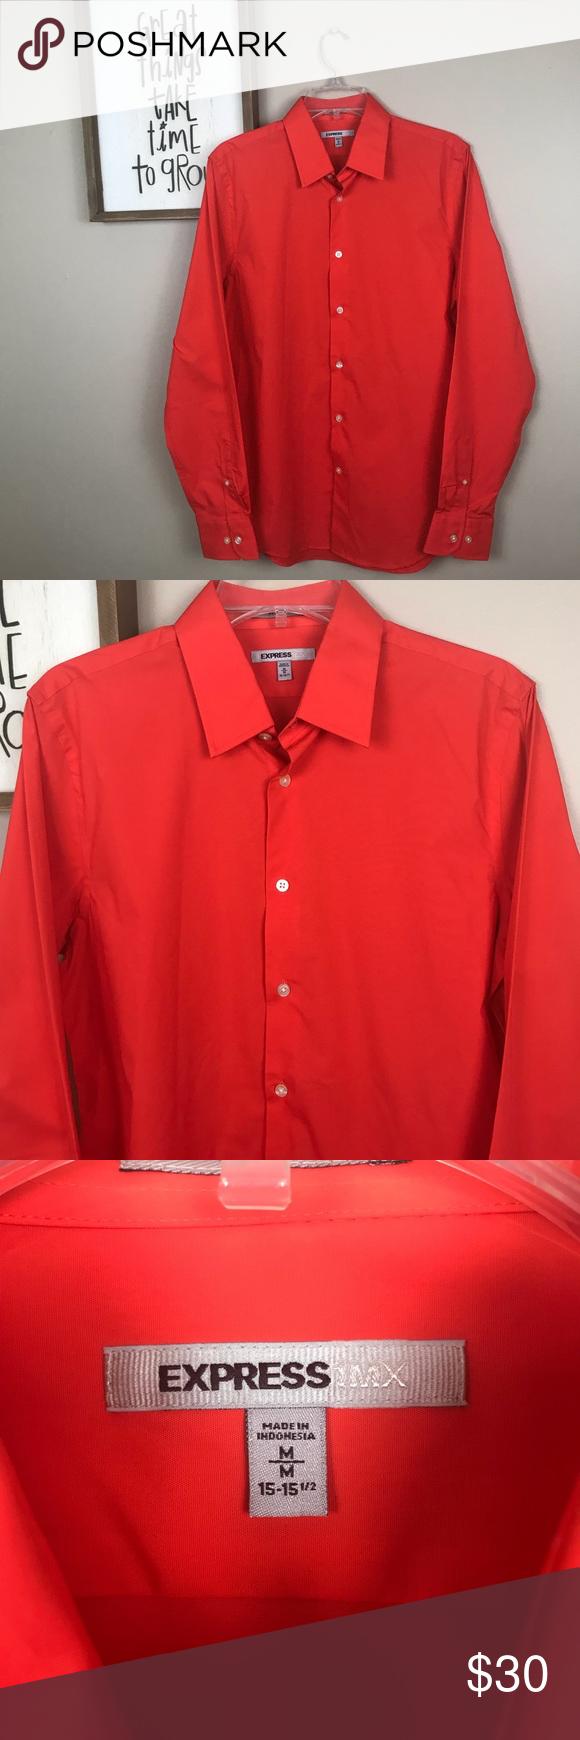 Nwot Express 1mx Burnt Orange Men S Dress Shirt Nwot Express 1mx M 15 15 1 2 Burnt Orange Men S Dress Shirt With No Def Mens Shirt Dress Clothes Design Shirts [ 1740 x 580 Pixel ]